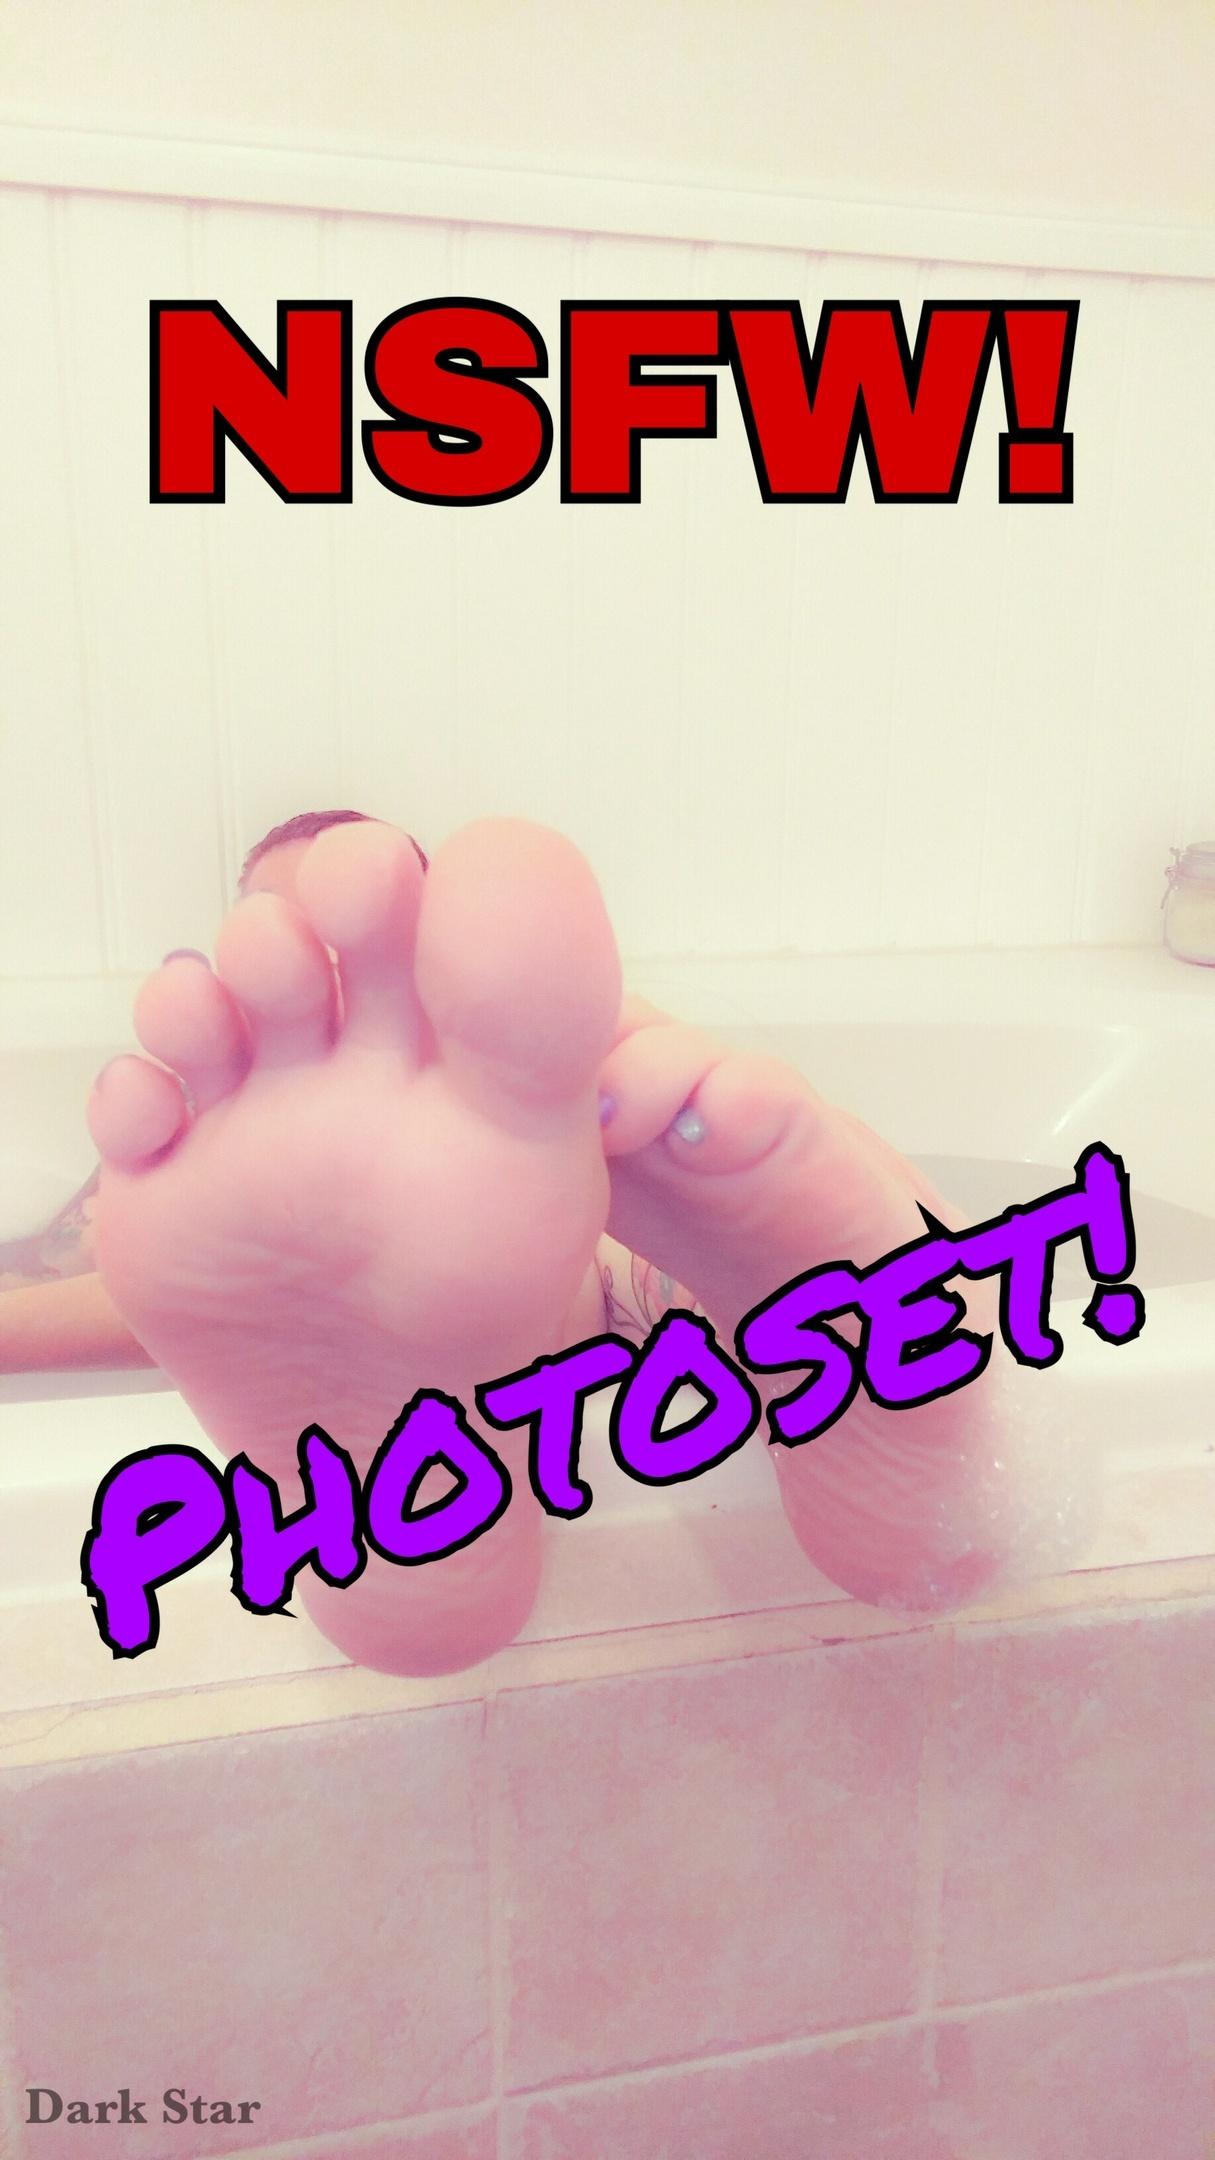 Tub Fun NSFW Part 1 - Wicked Lil Pam Star